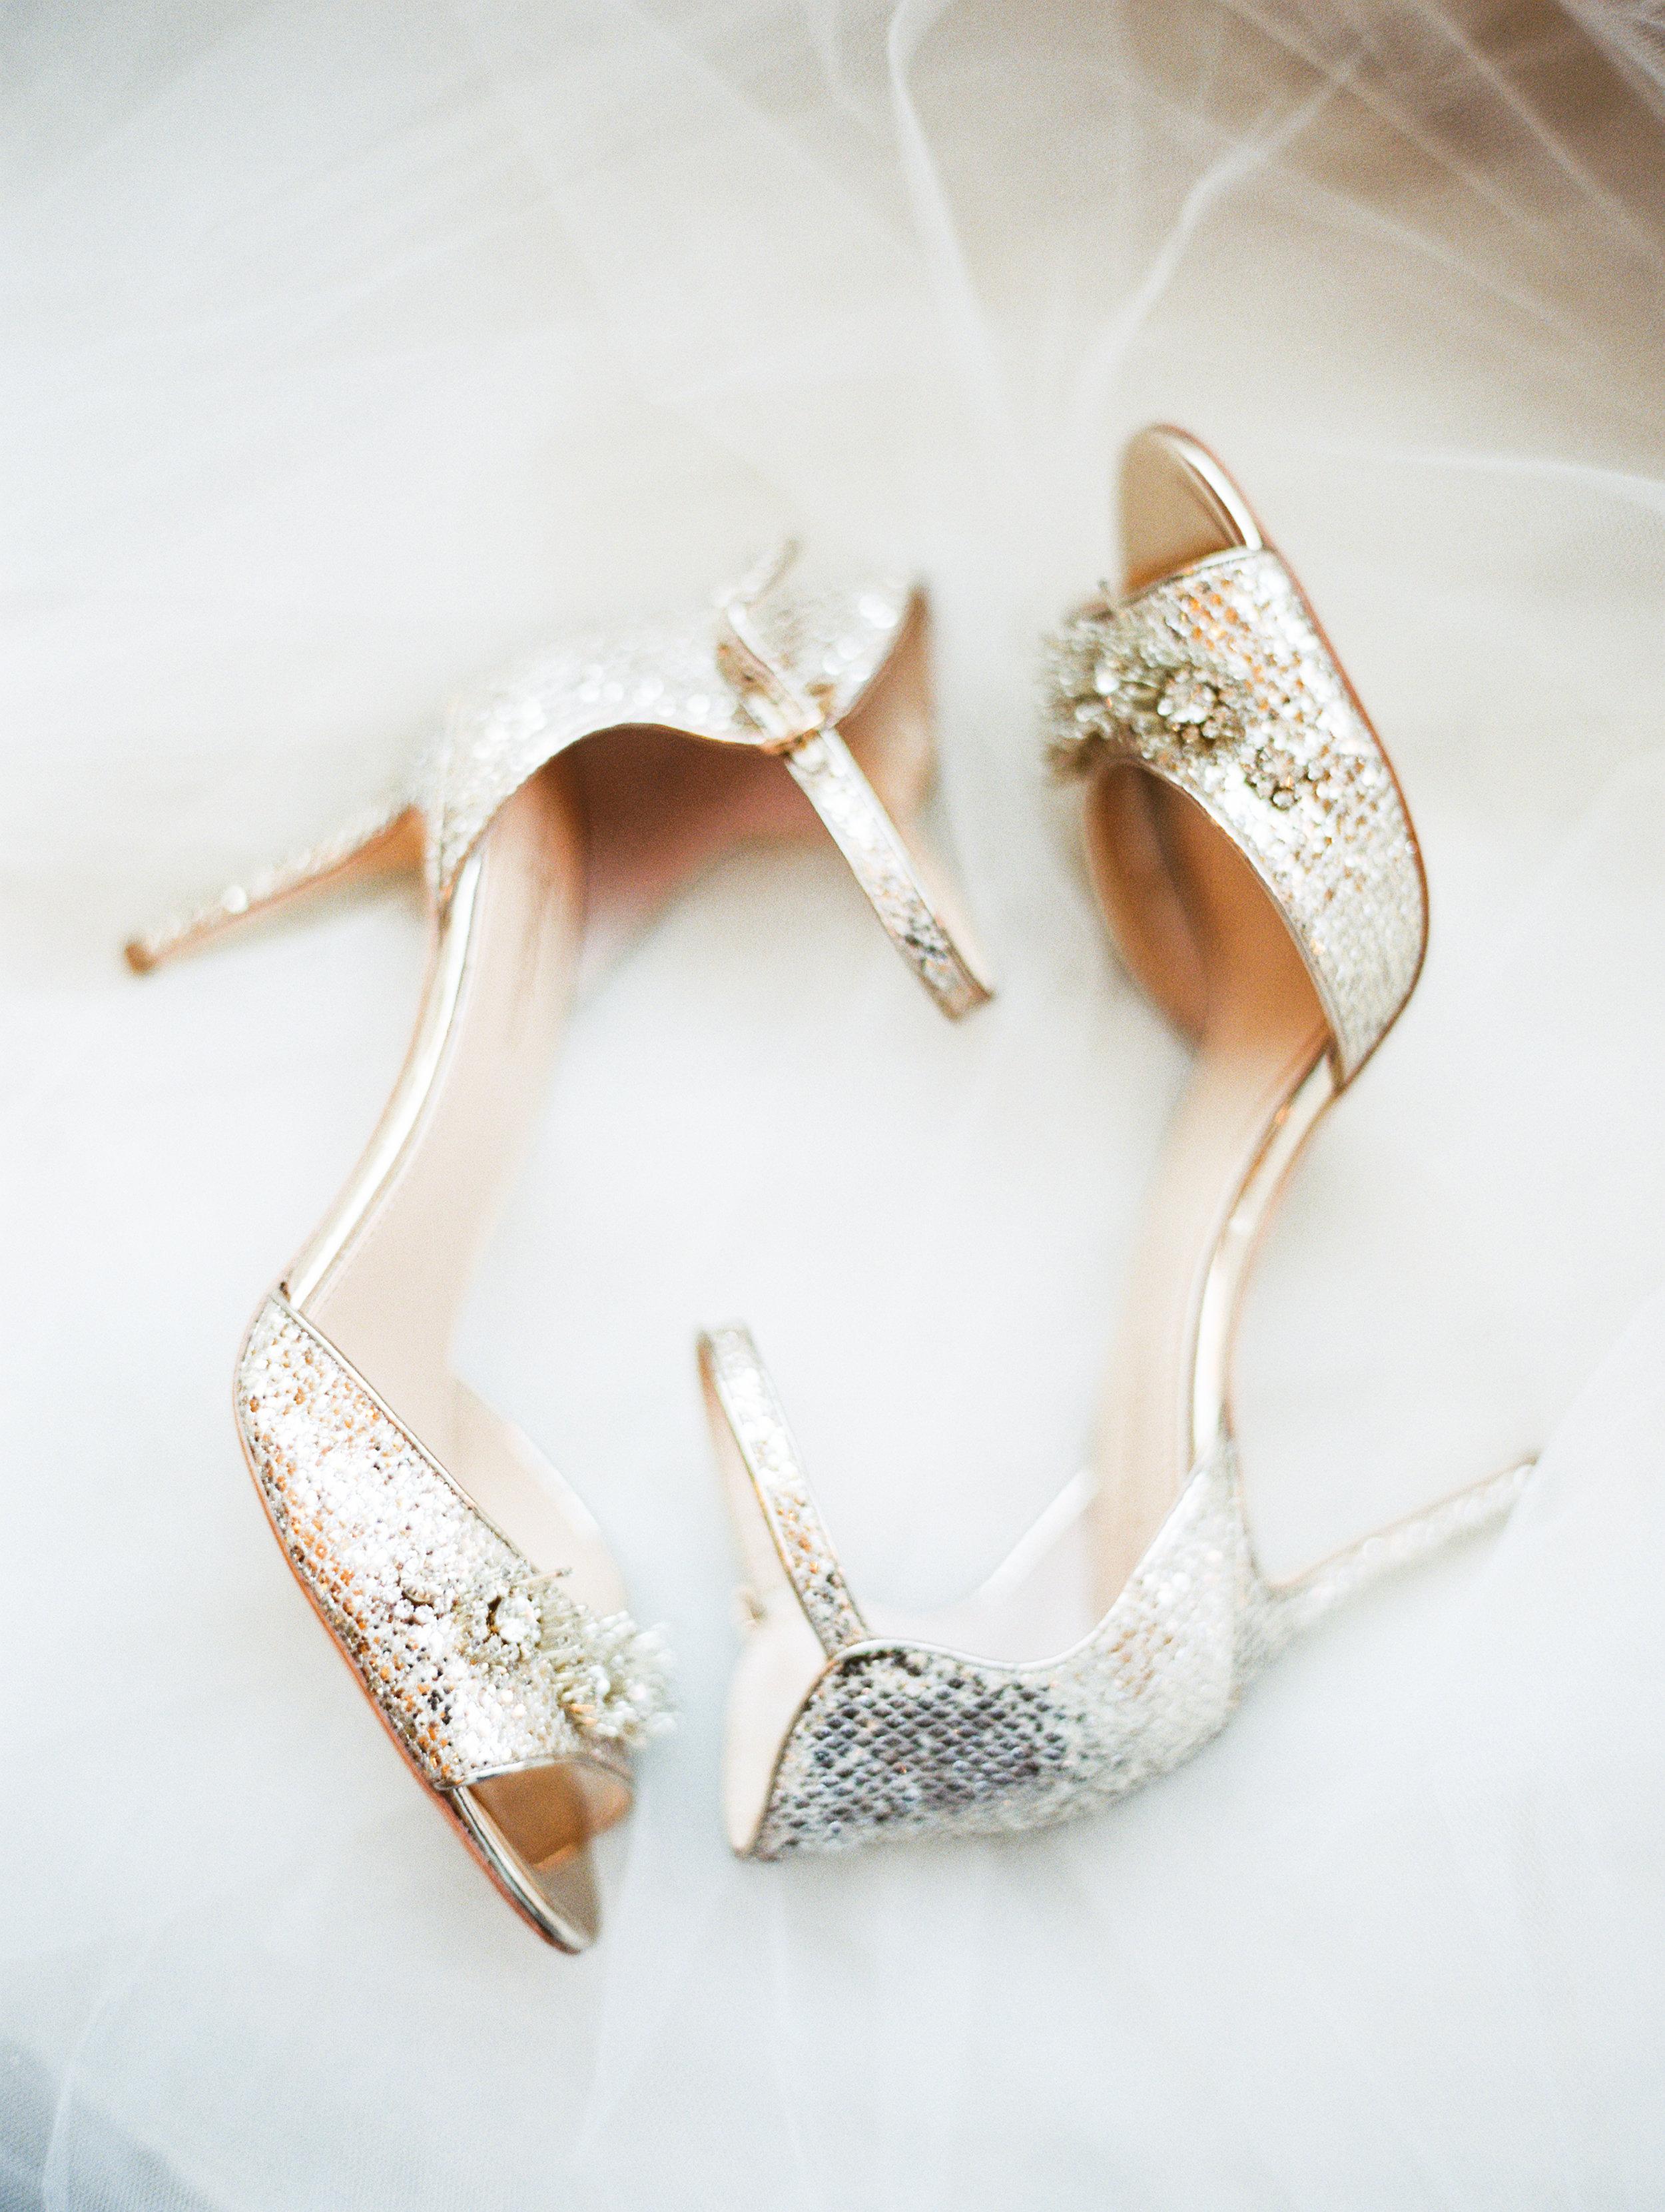 Vogelzang+Wedding+Details+b-36.jpg